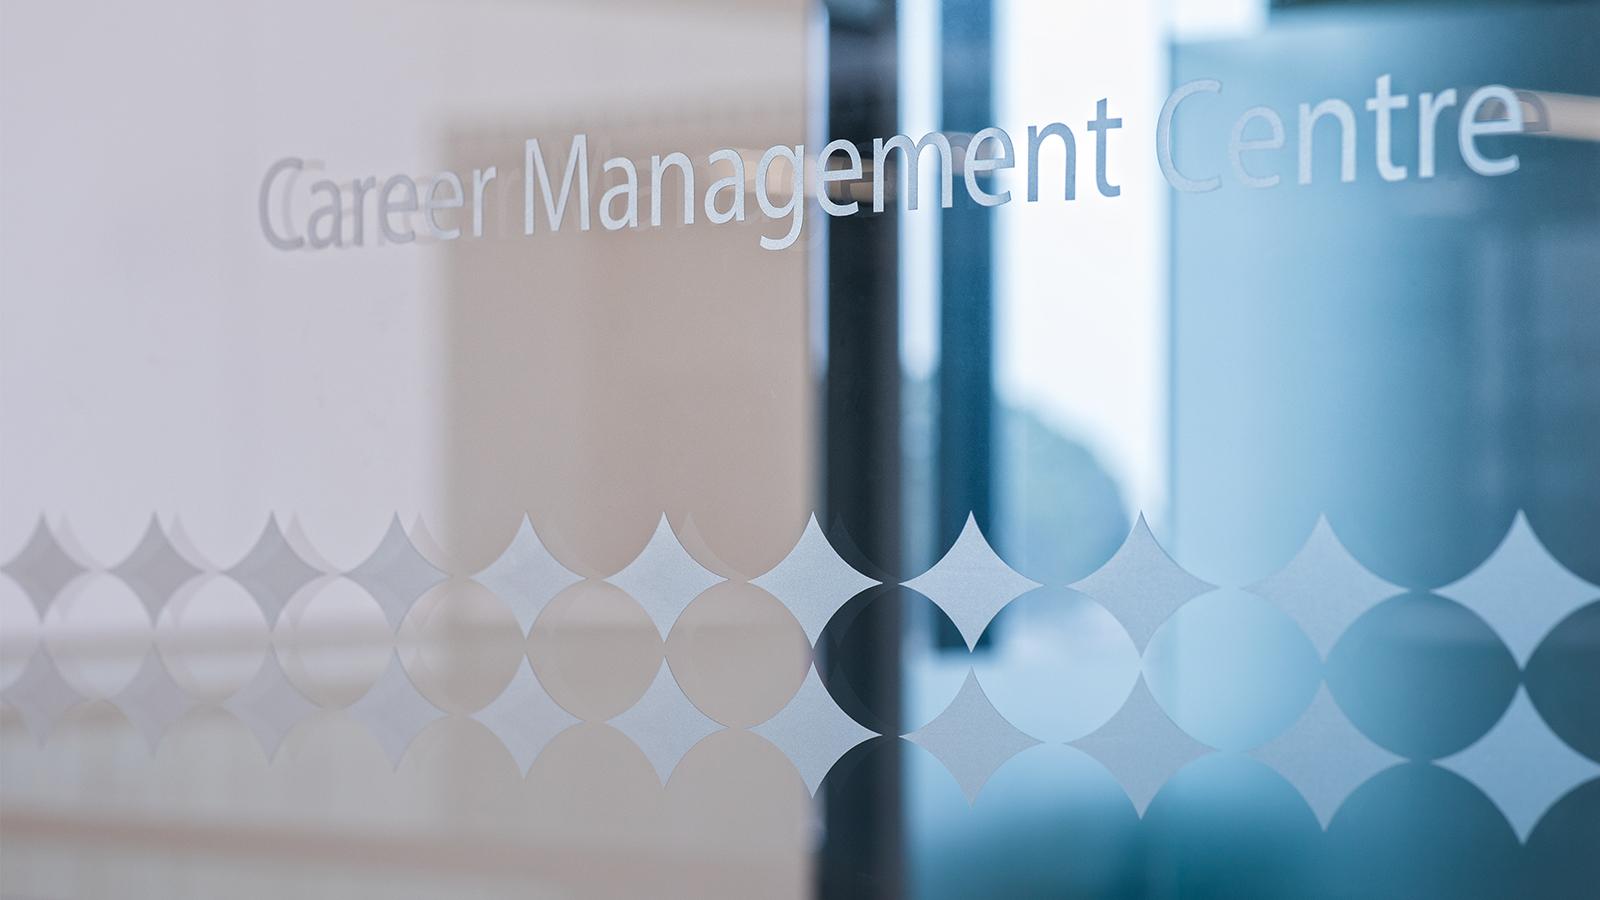 Career Management Centre window